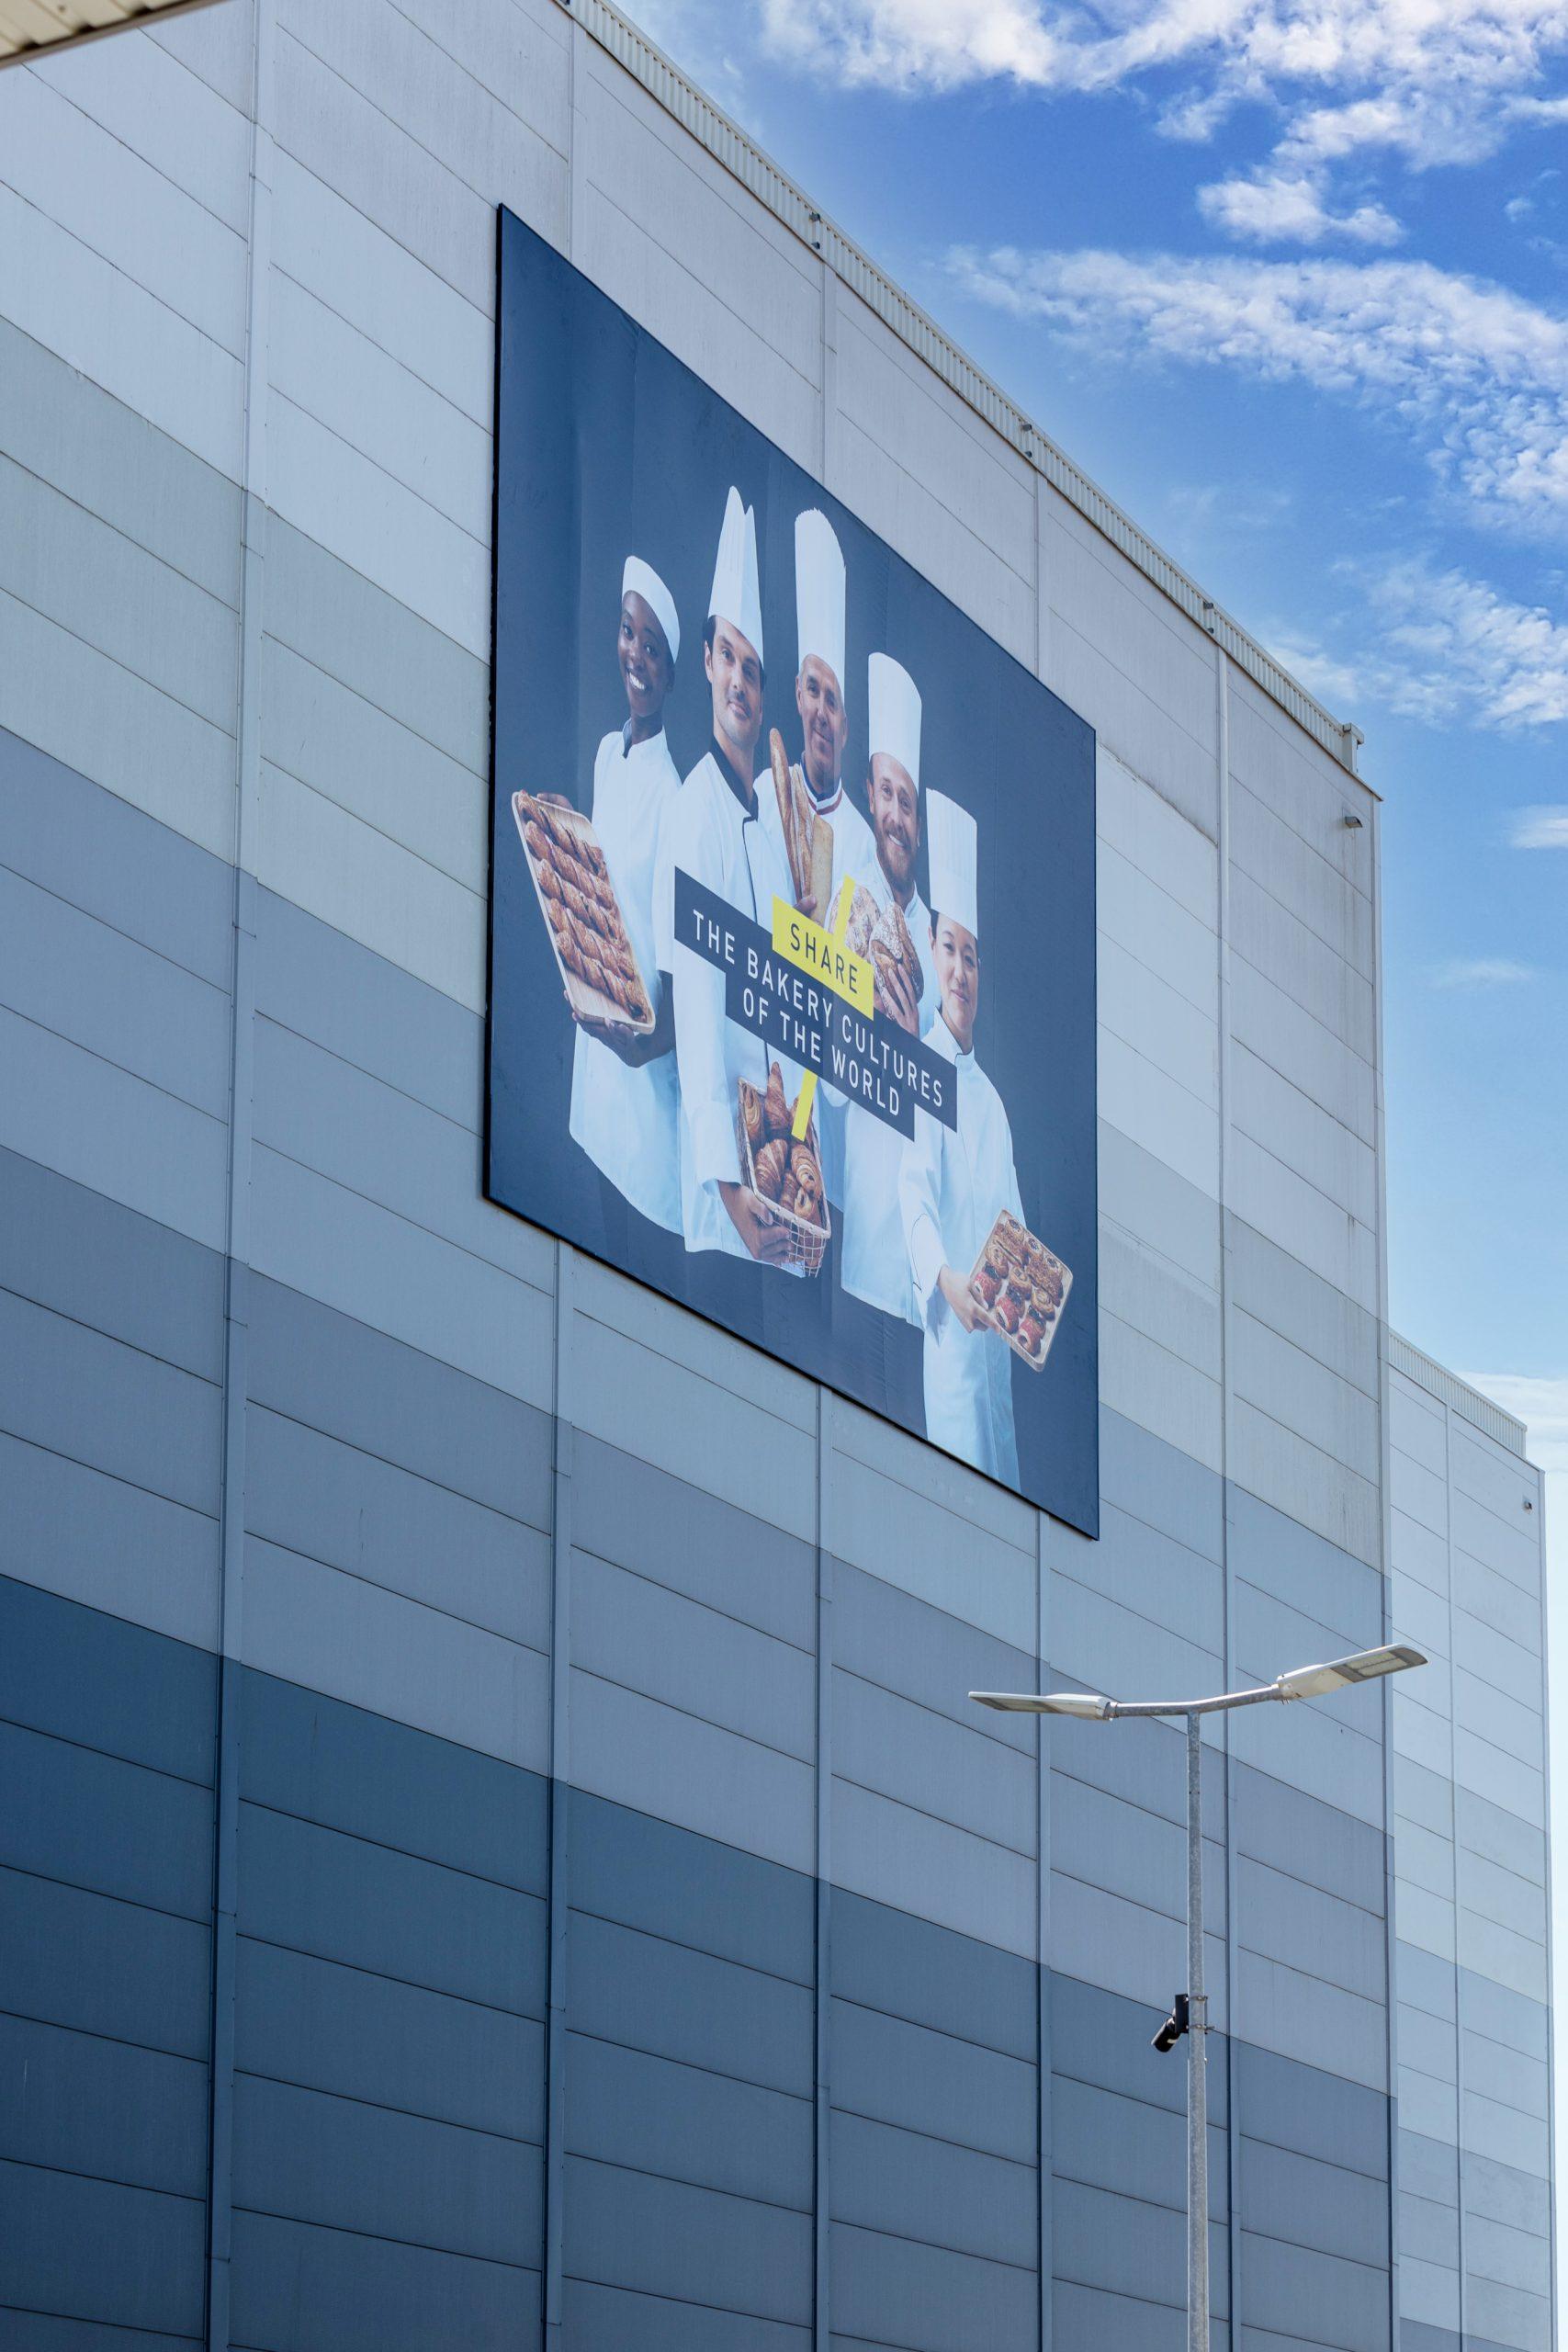 affiche-bridor-boulanger-facade